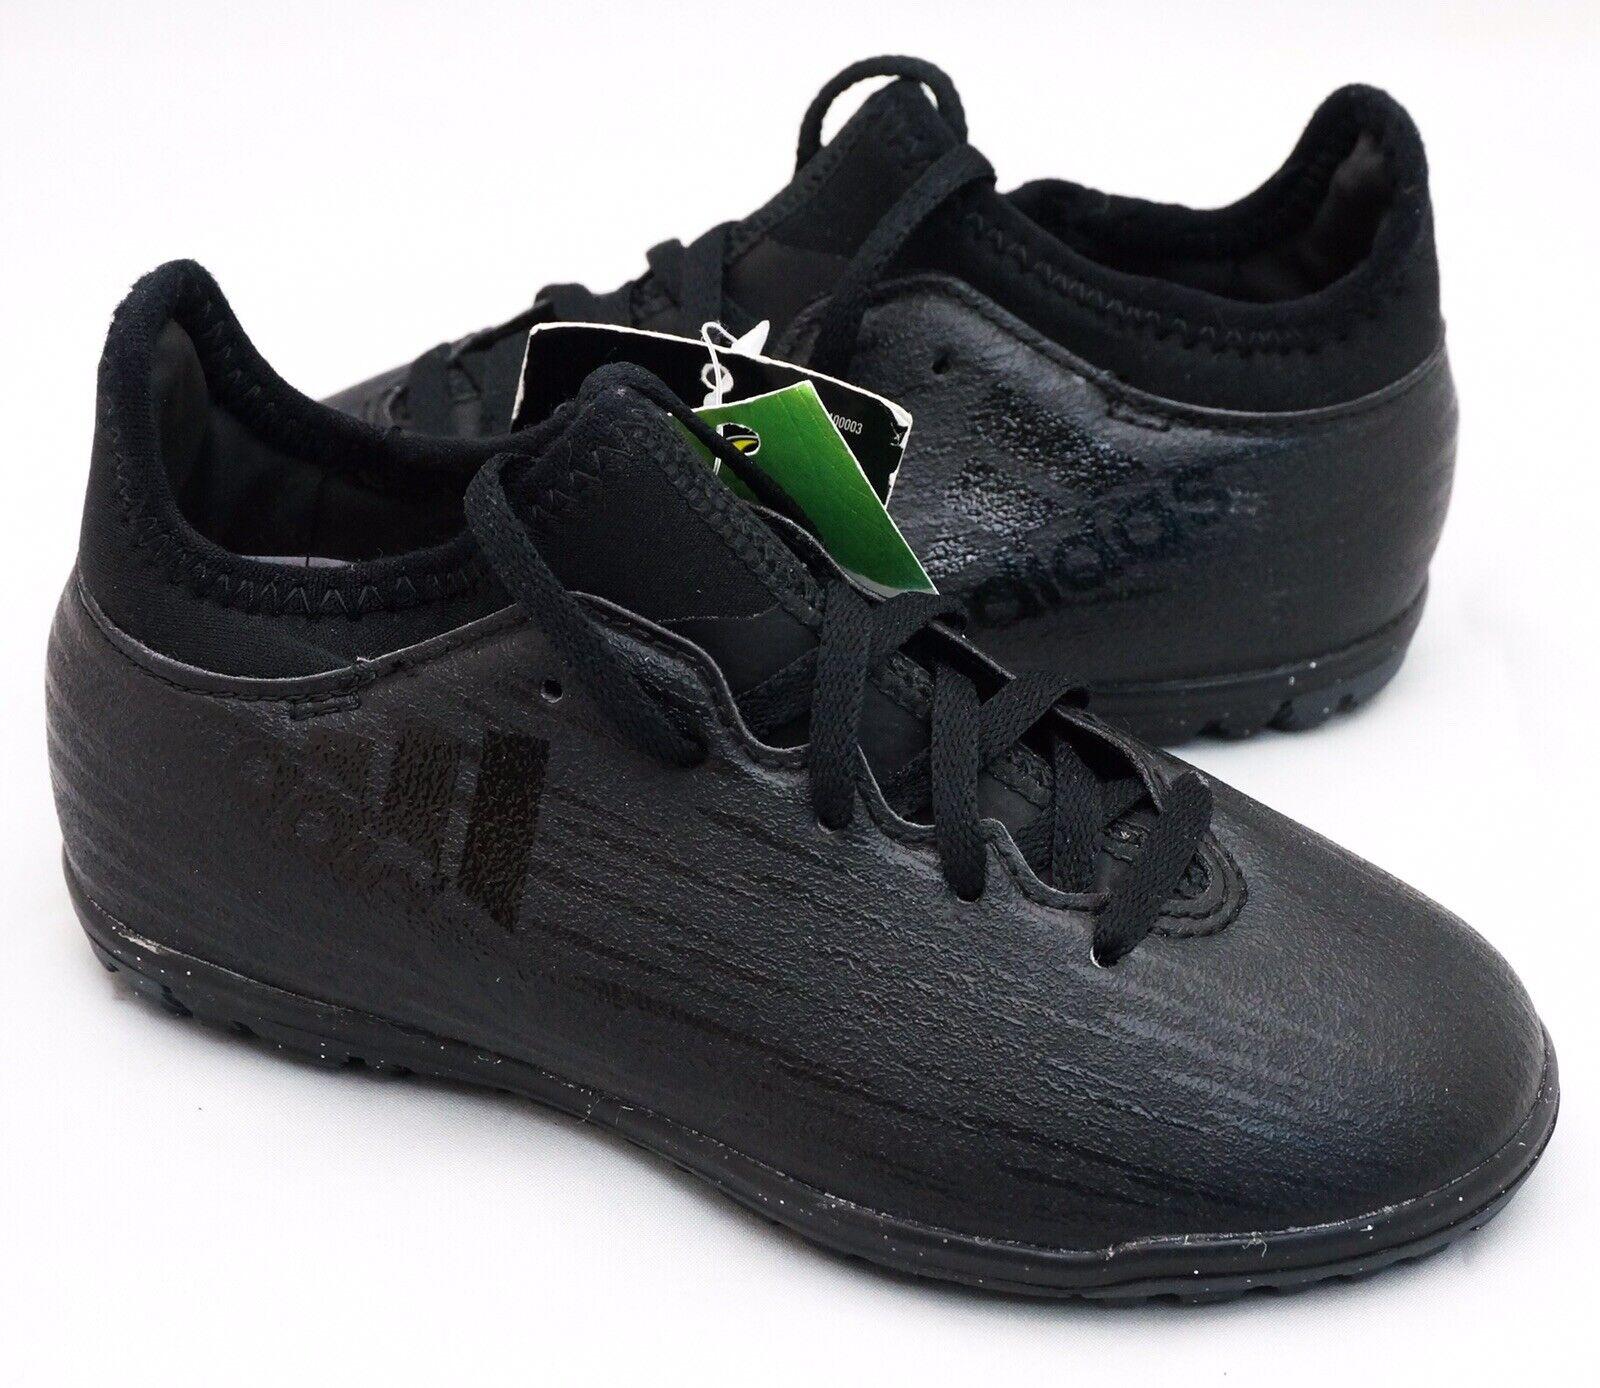 e79665636 16.3 Turf Soccer Training shoes Kids 11K Adidas X nsyeai6126-Youth ...